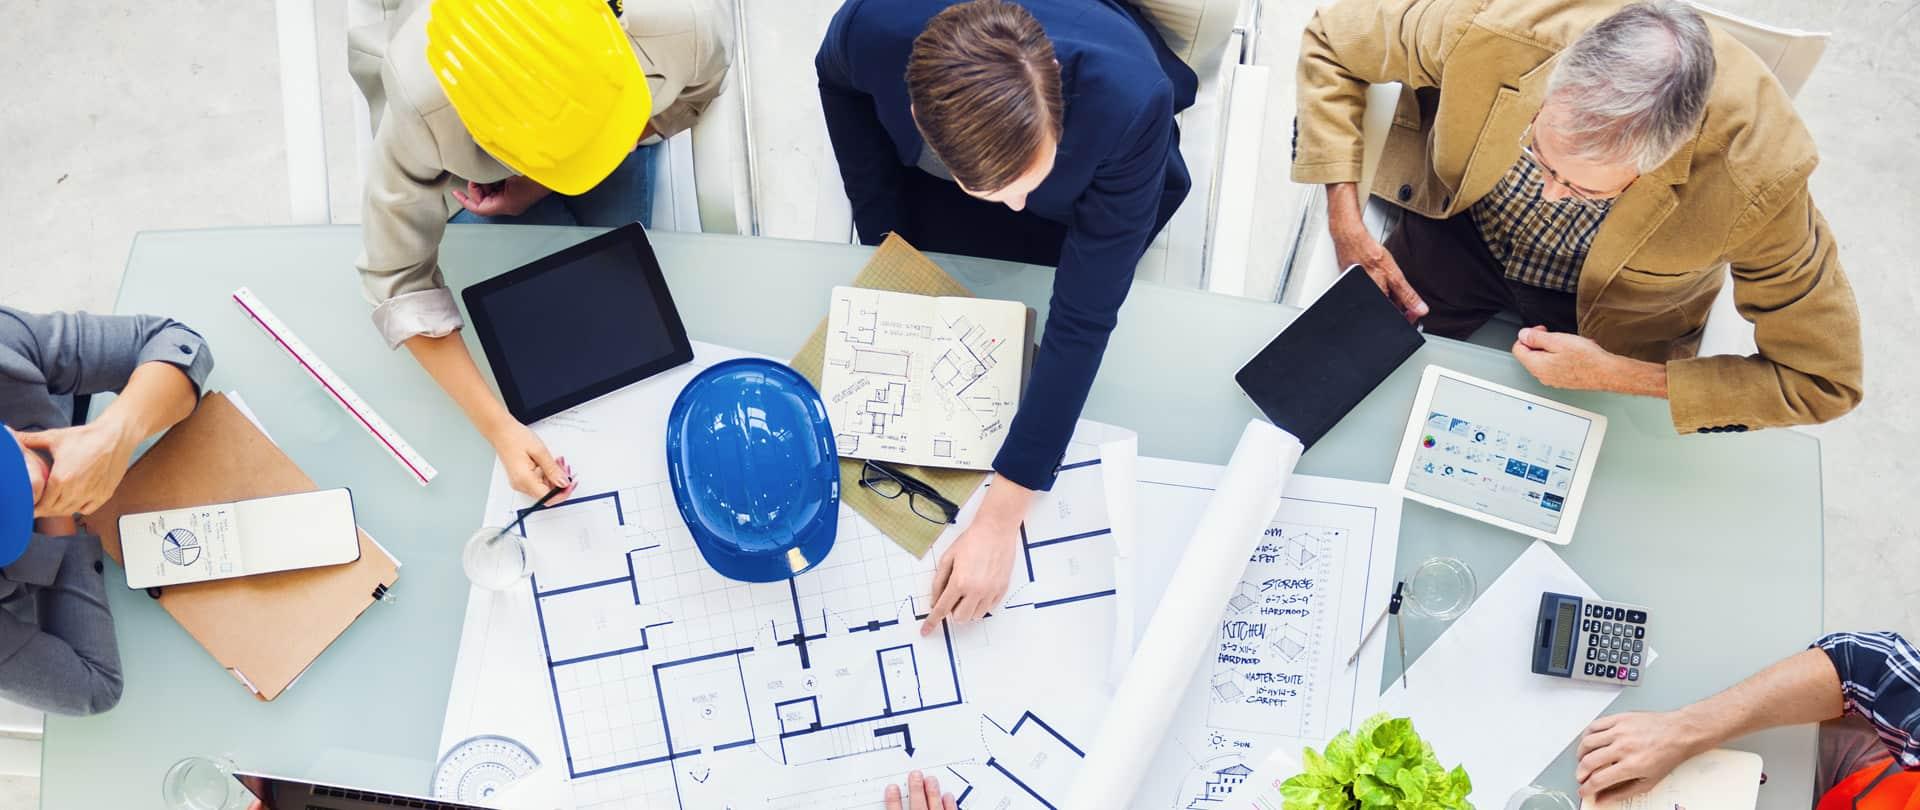 project management marketing banner